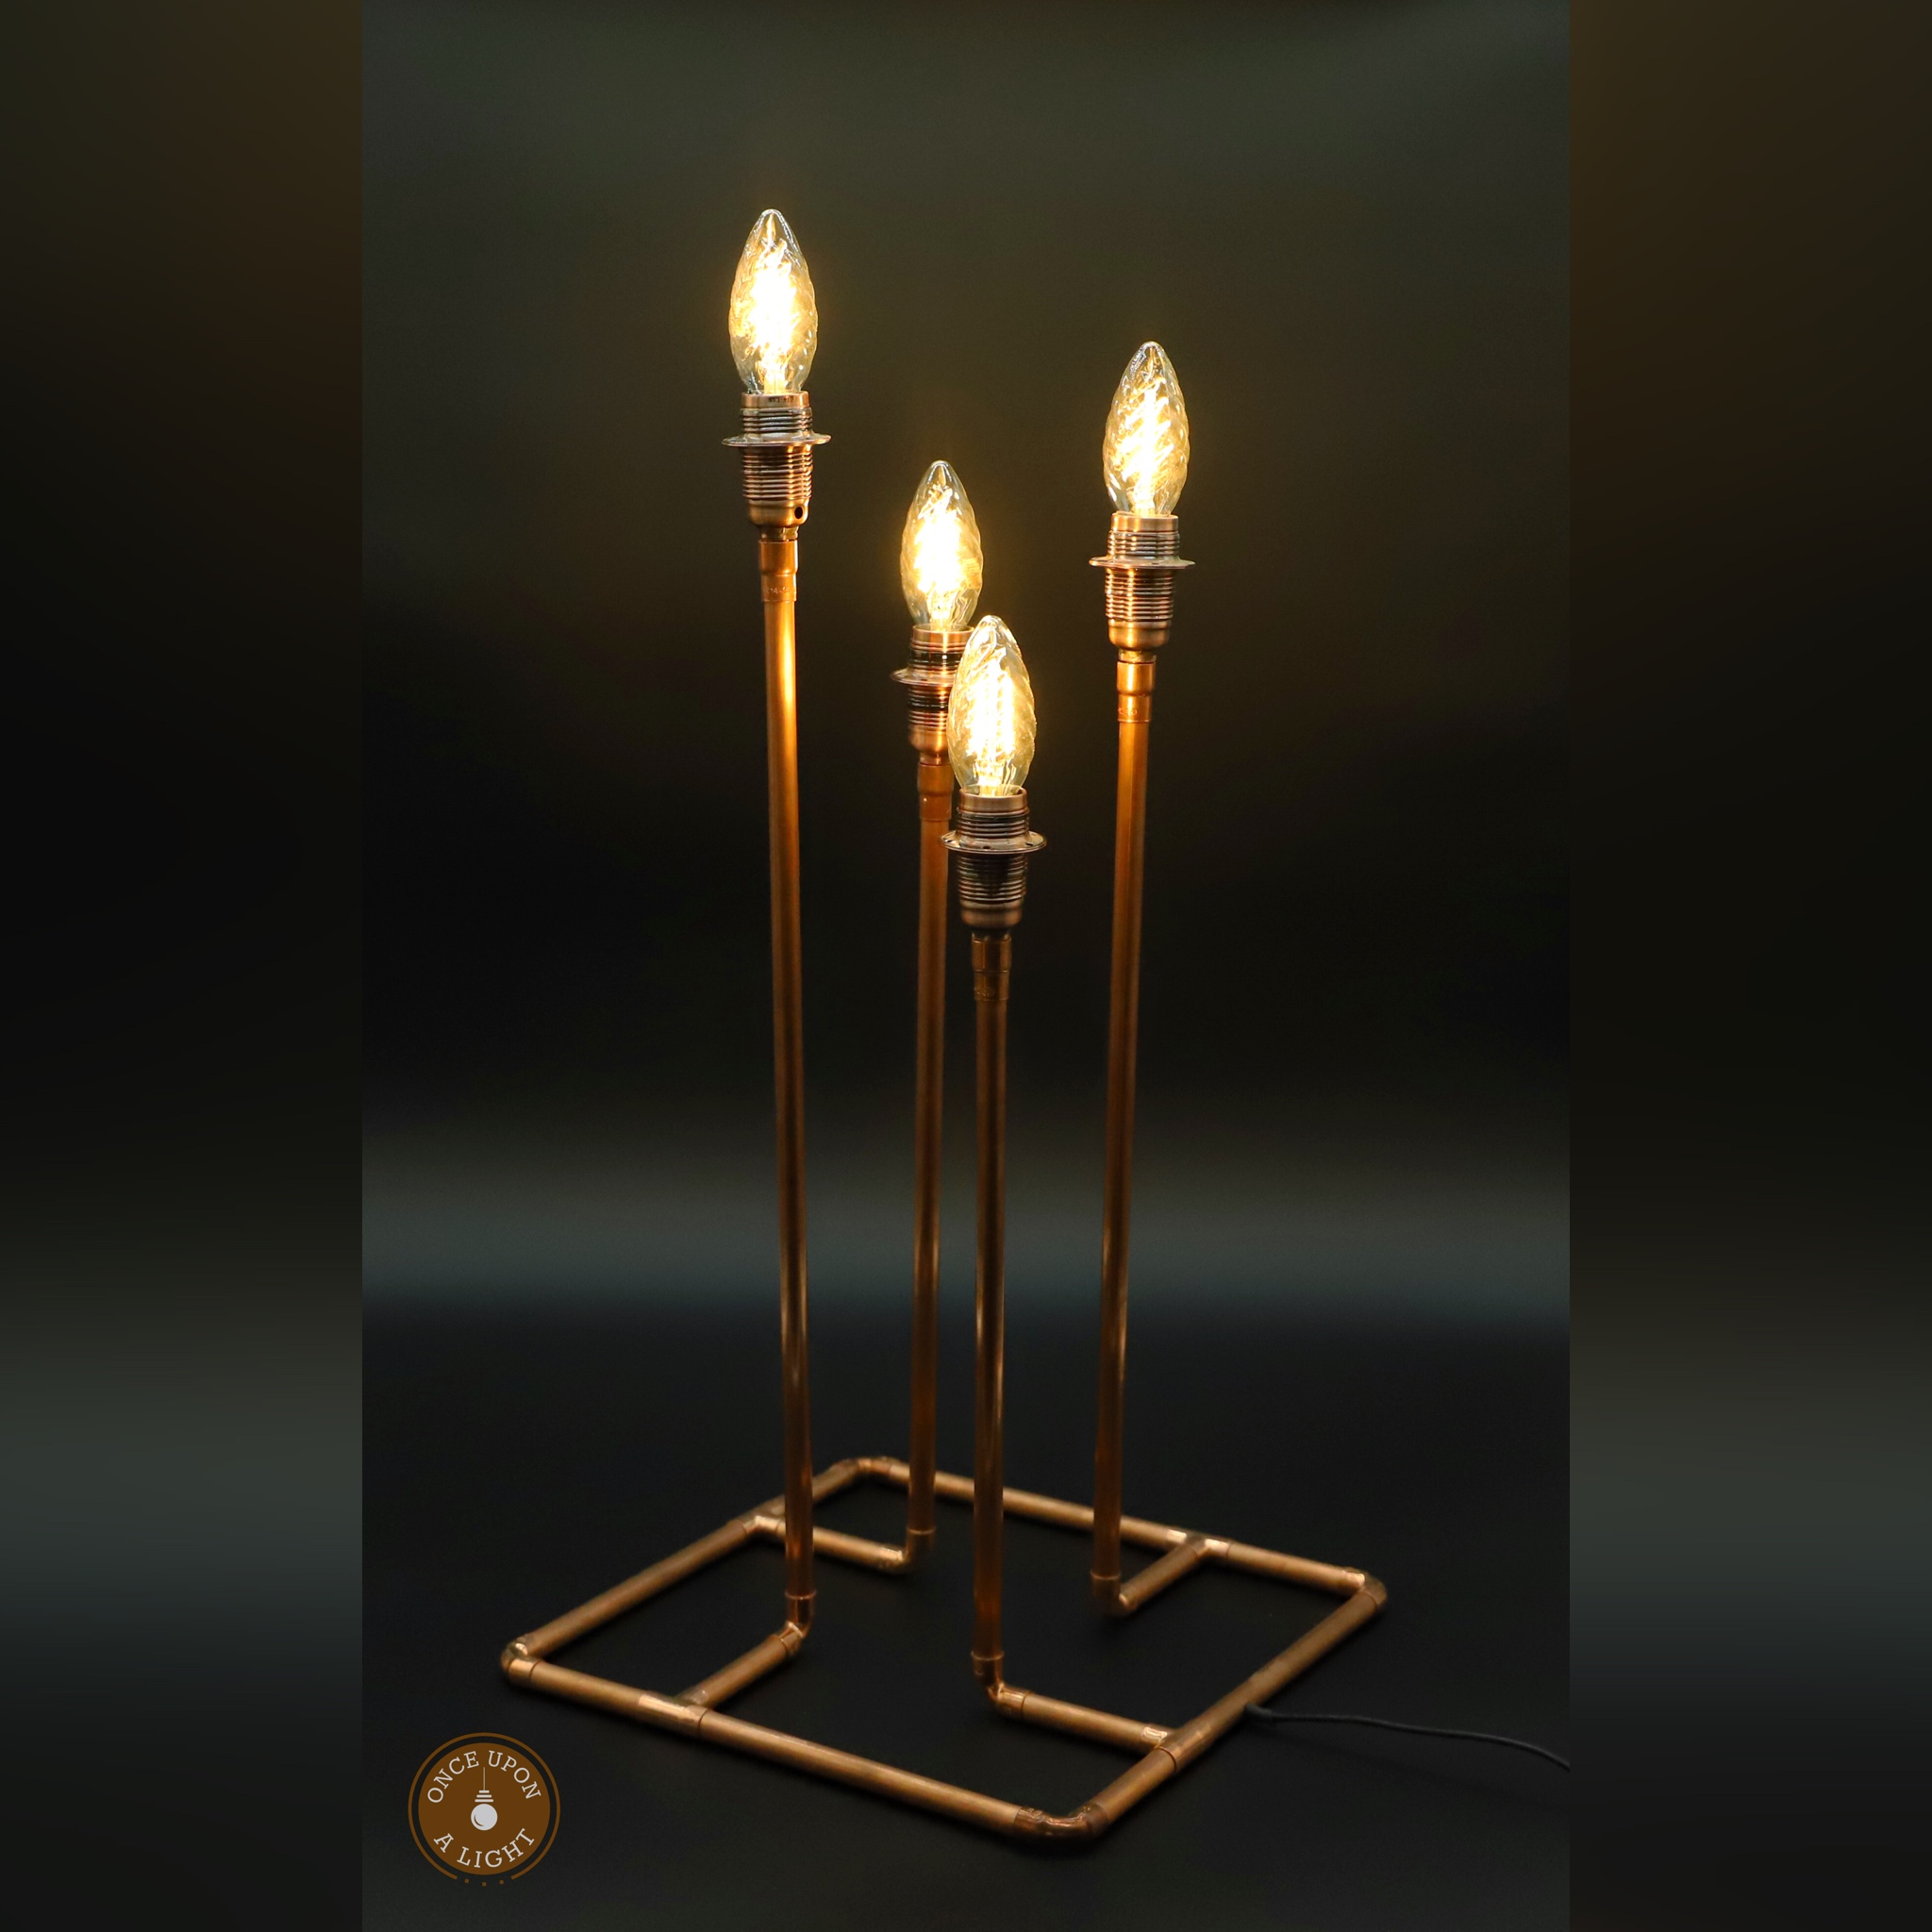 Lampe de table en cuivre facon chandelier